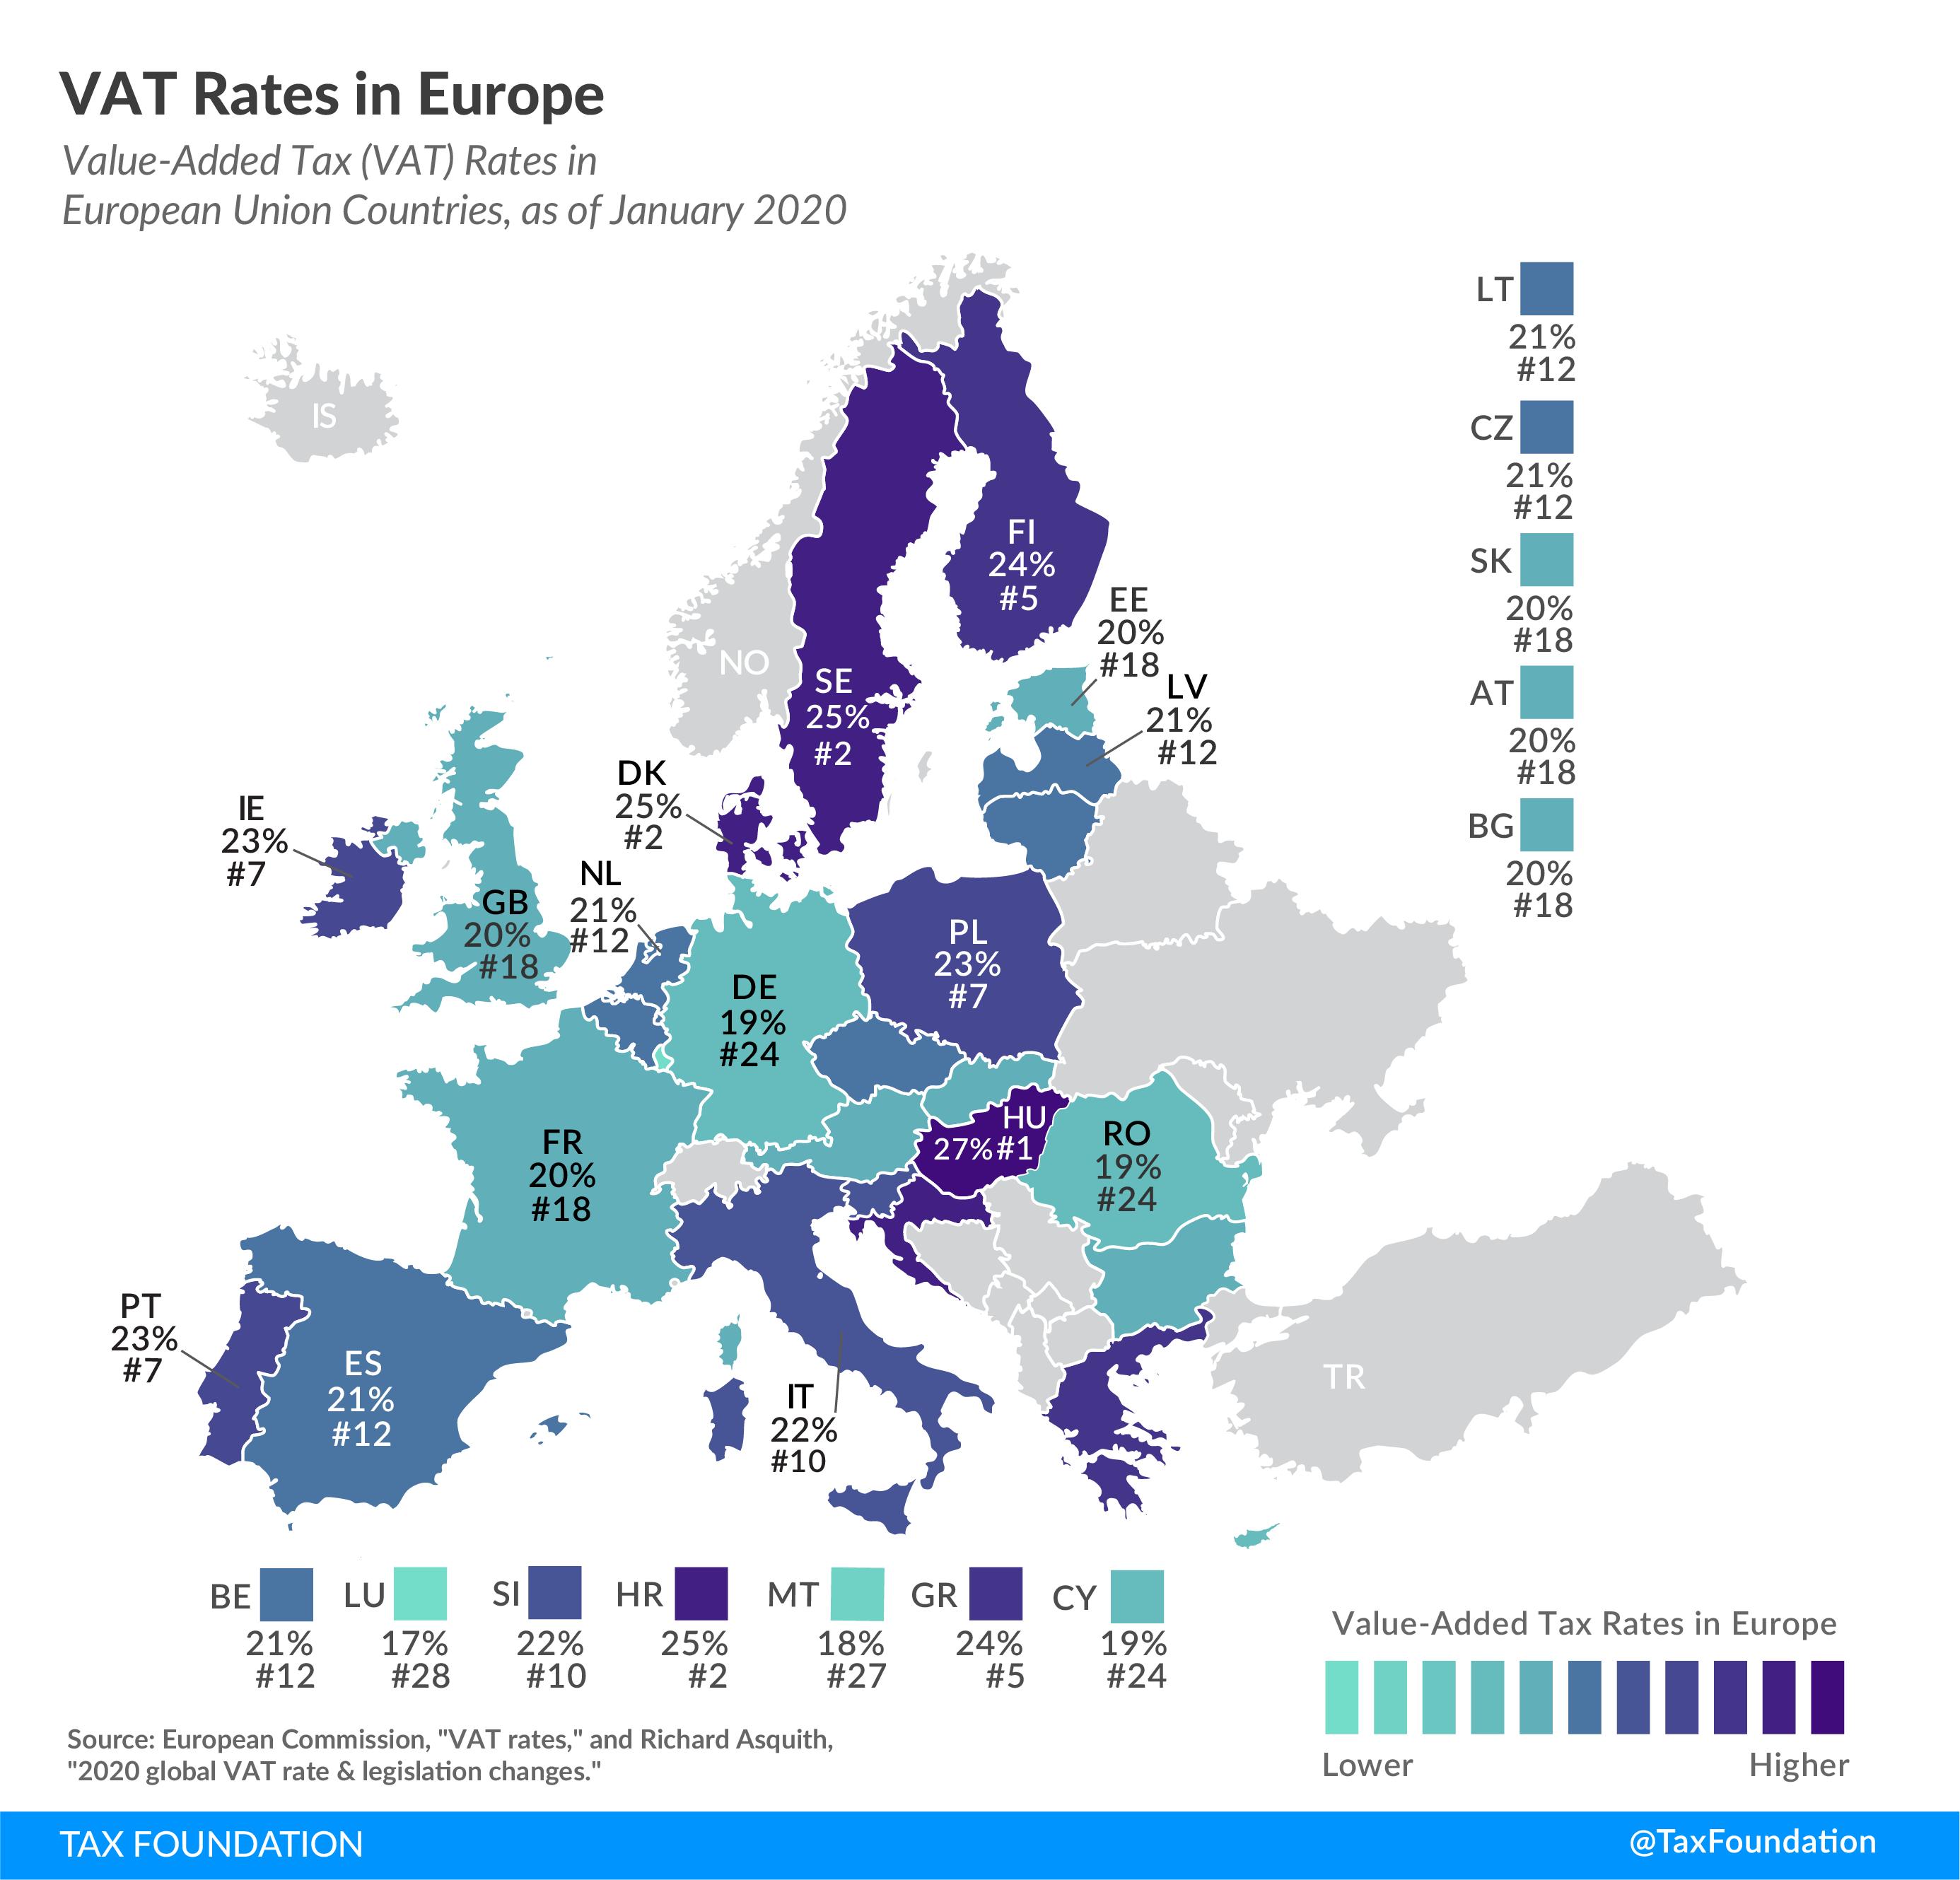 VAT Rates in Europe, 2020 VAT rates in Europe, 2020 VAT taxes in Europe, Value-added tax rates in Europe, value-added tax Europe